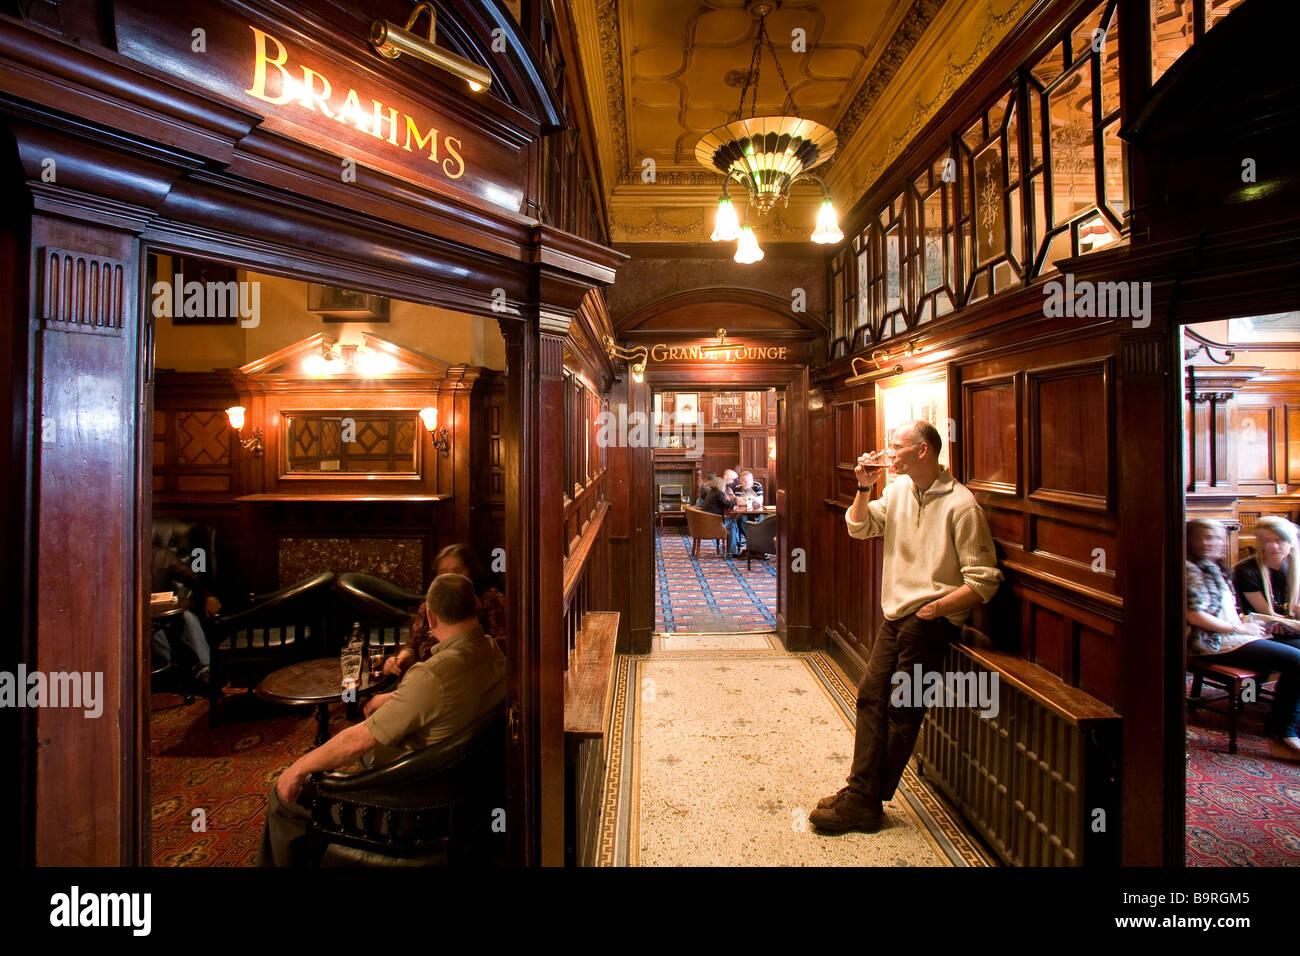 Philharmonic Pub Liverpool Pub Stock Photos Amp Philharmonic